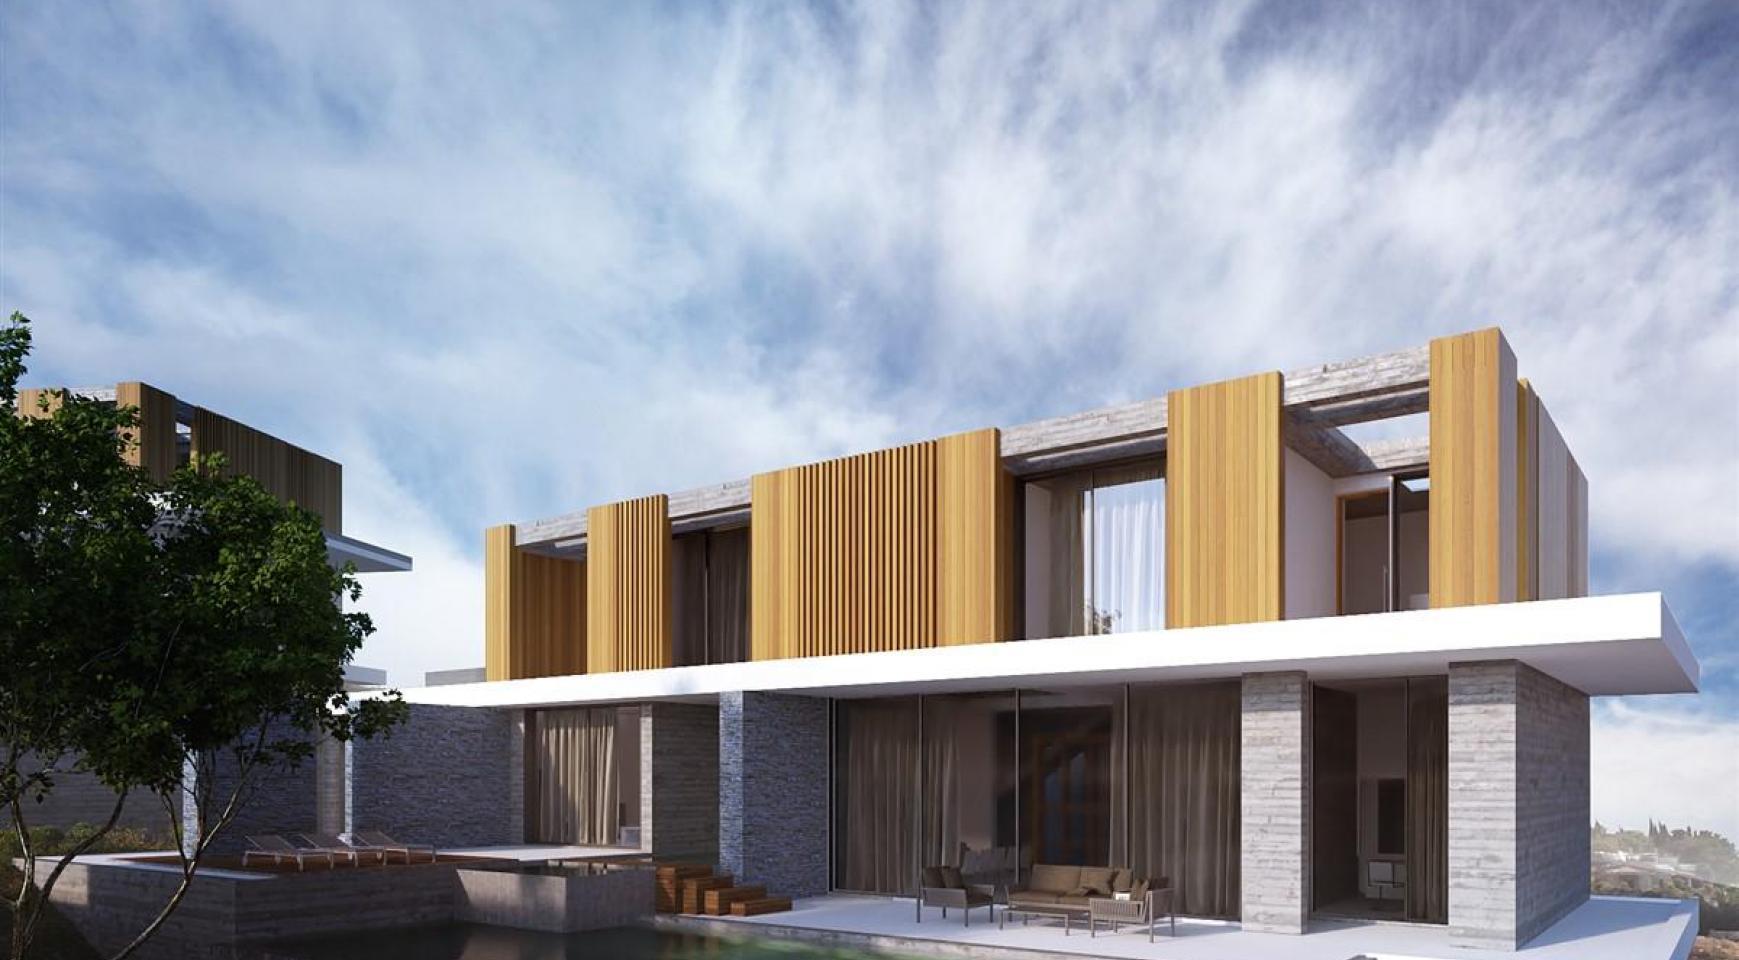 Exclusive 4 Bedroom Villa with Stunning Views in Germasogeia - 2